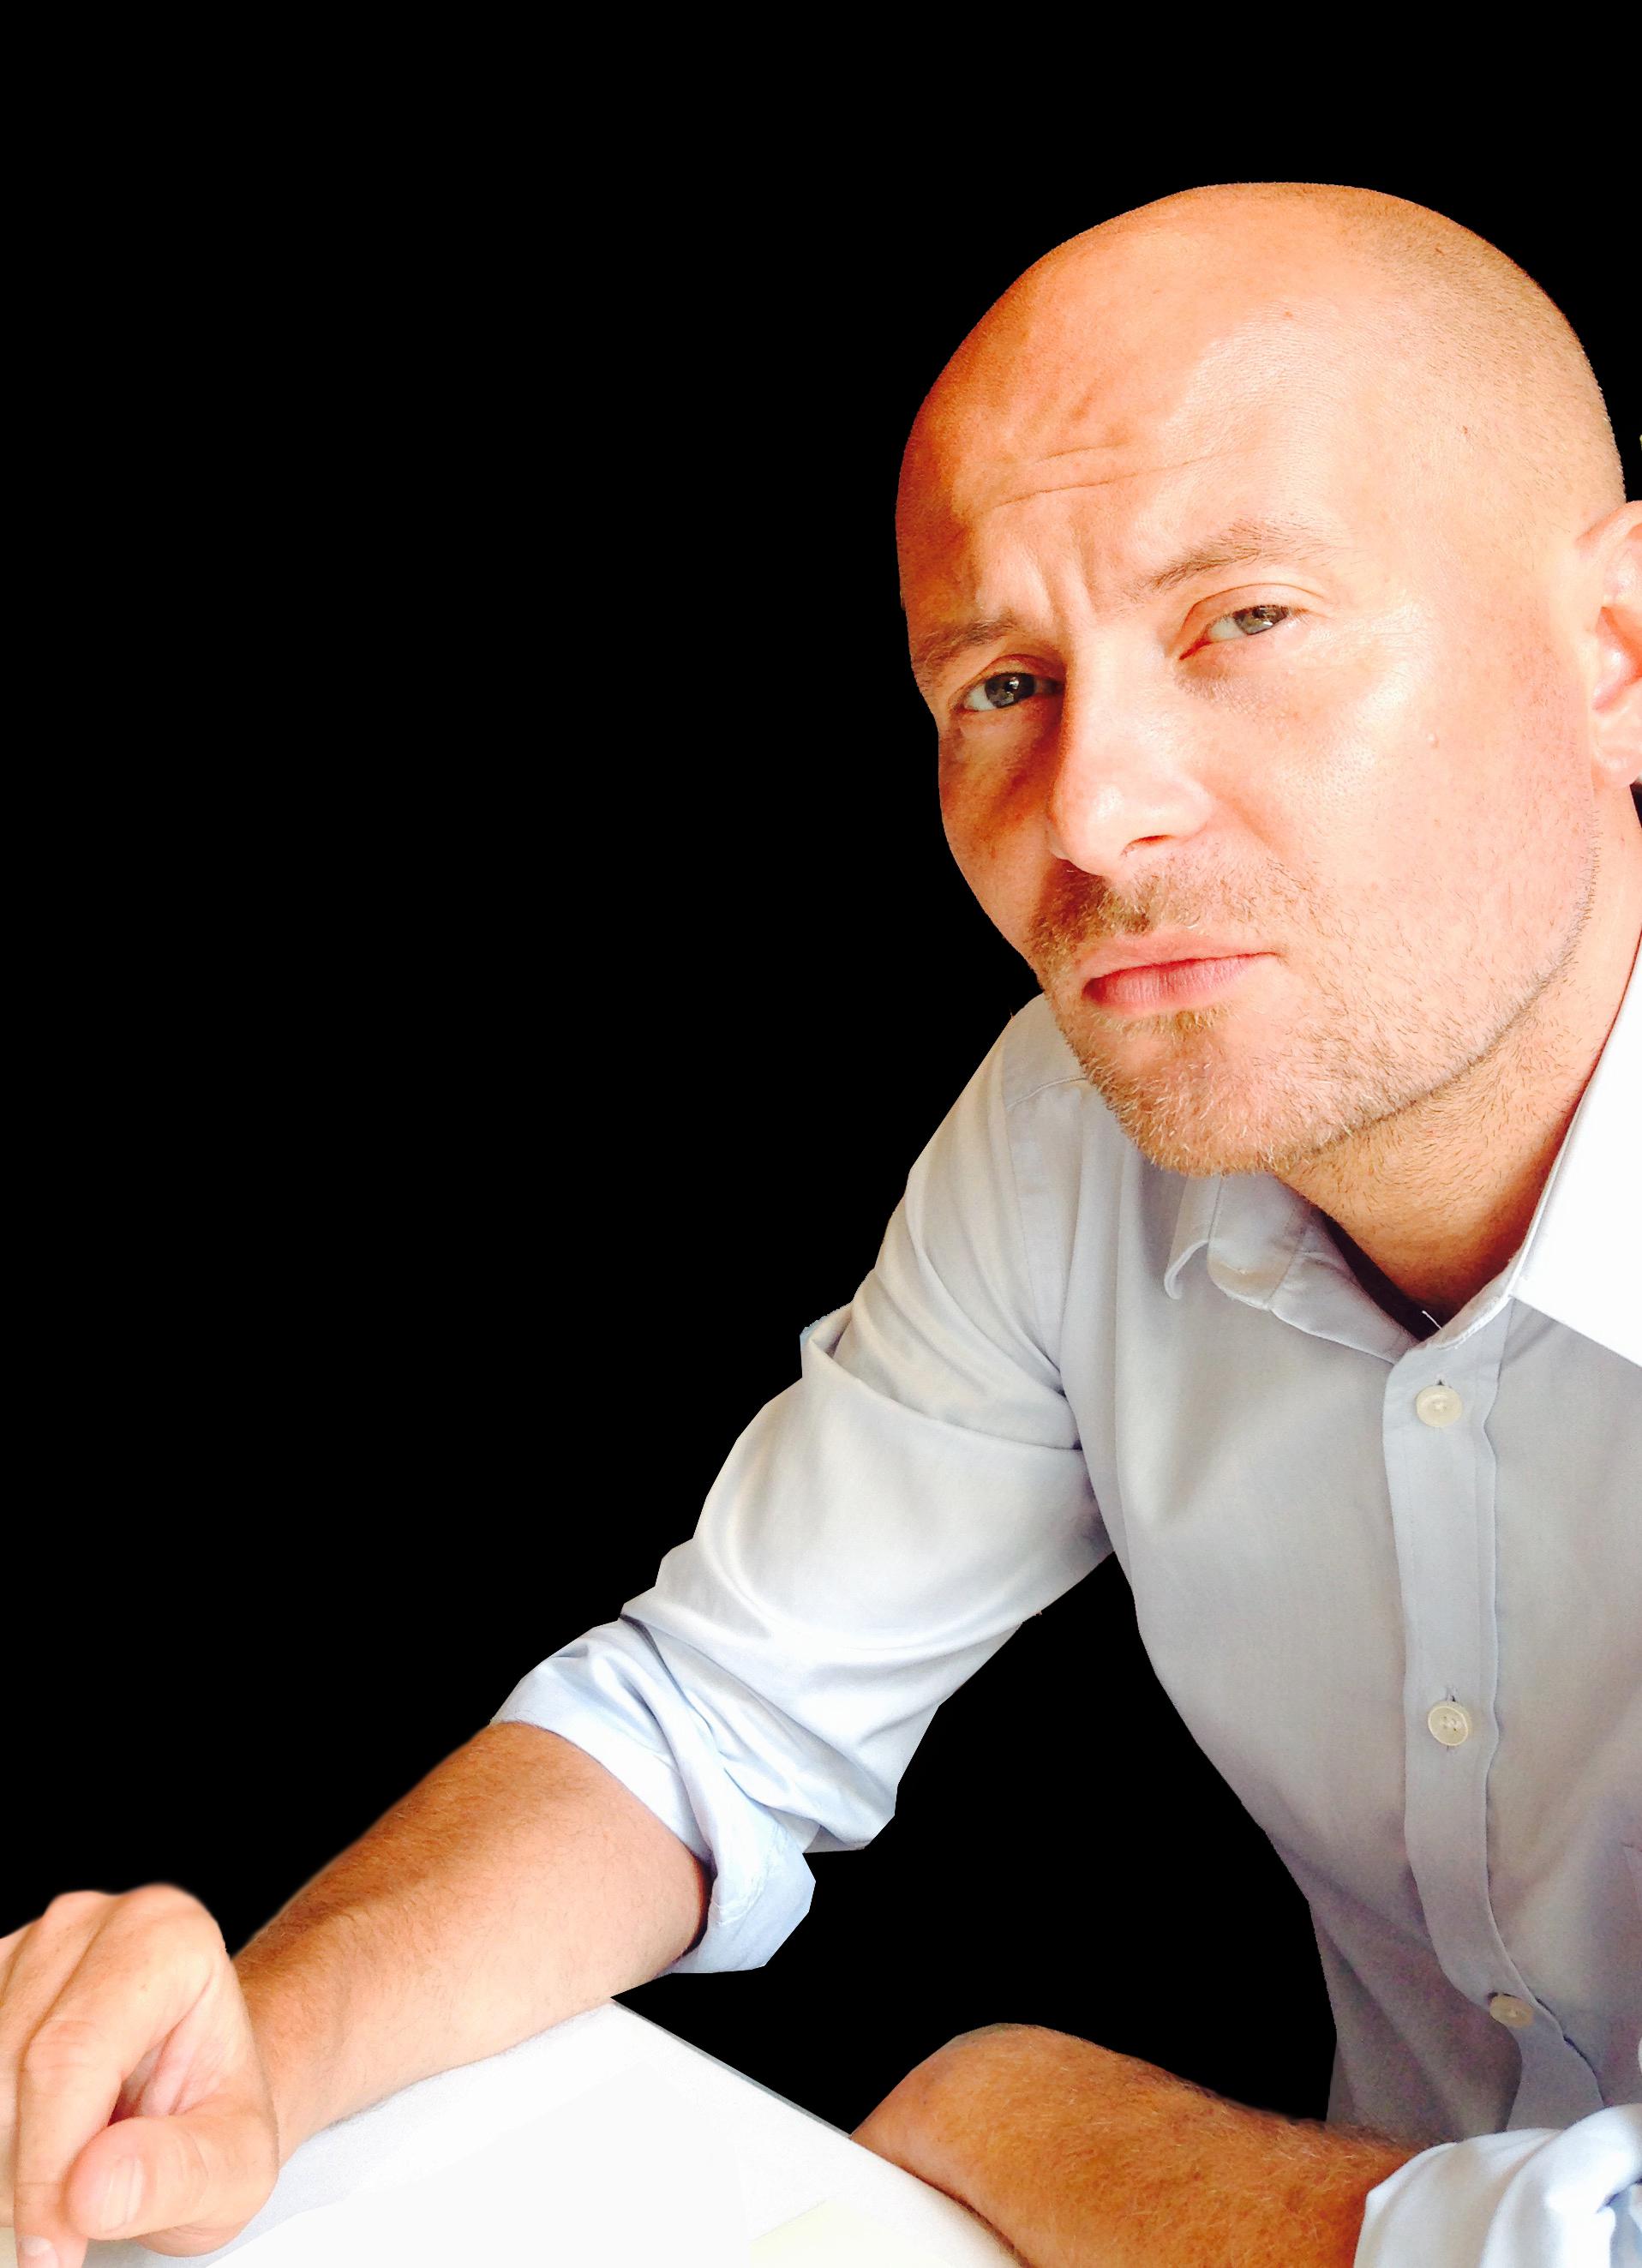 Piotr Jakub Fereński